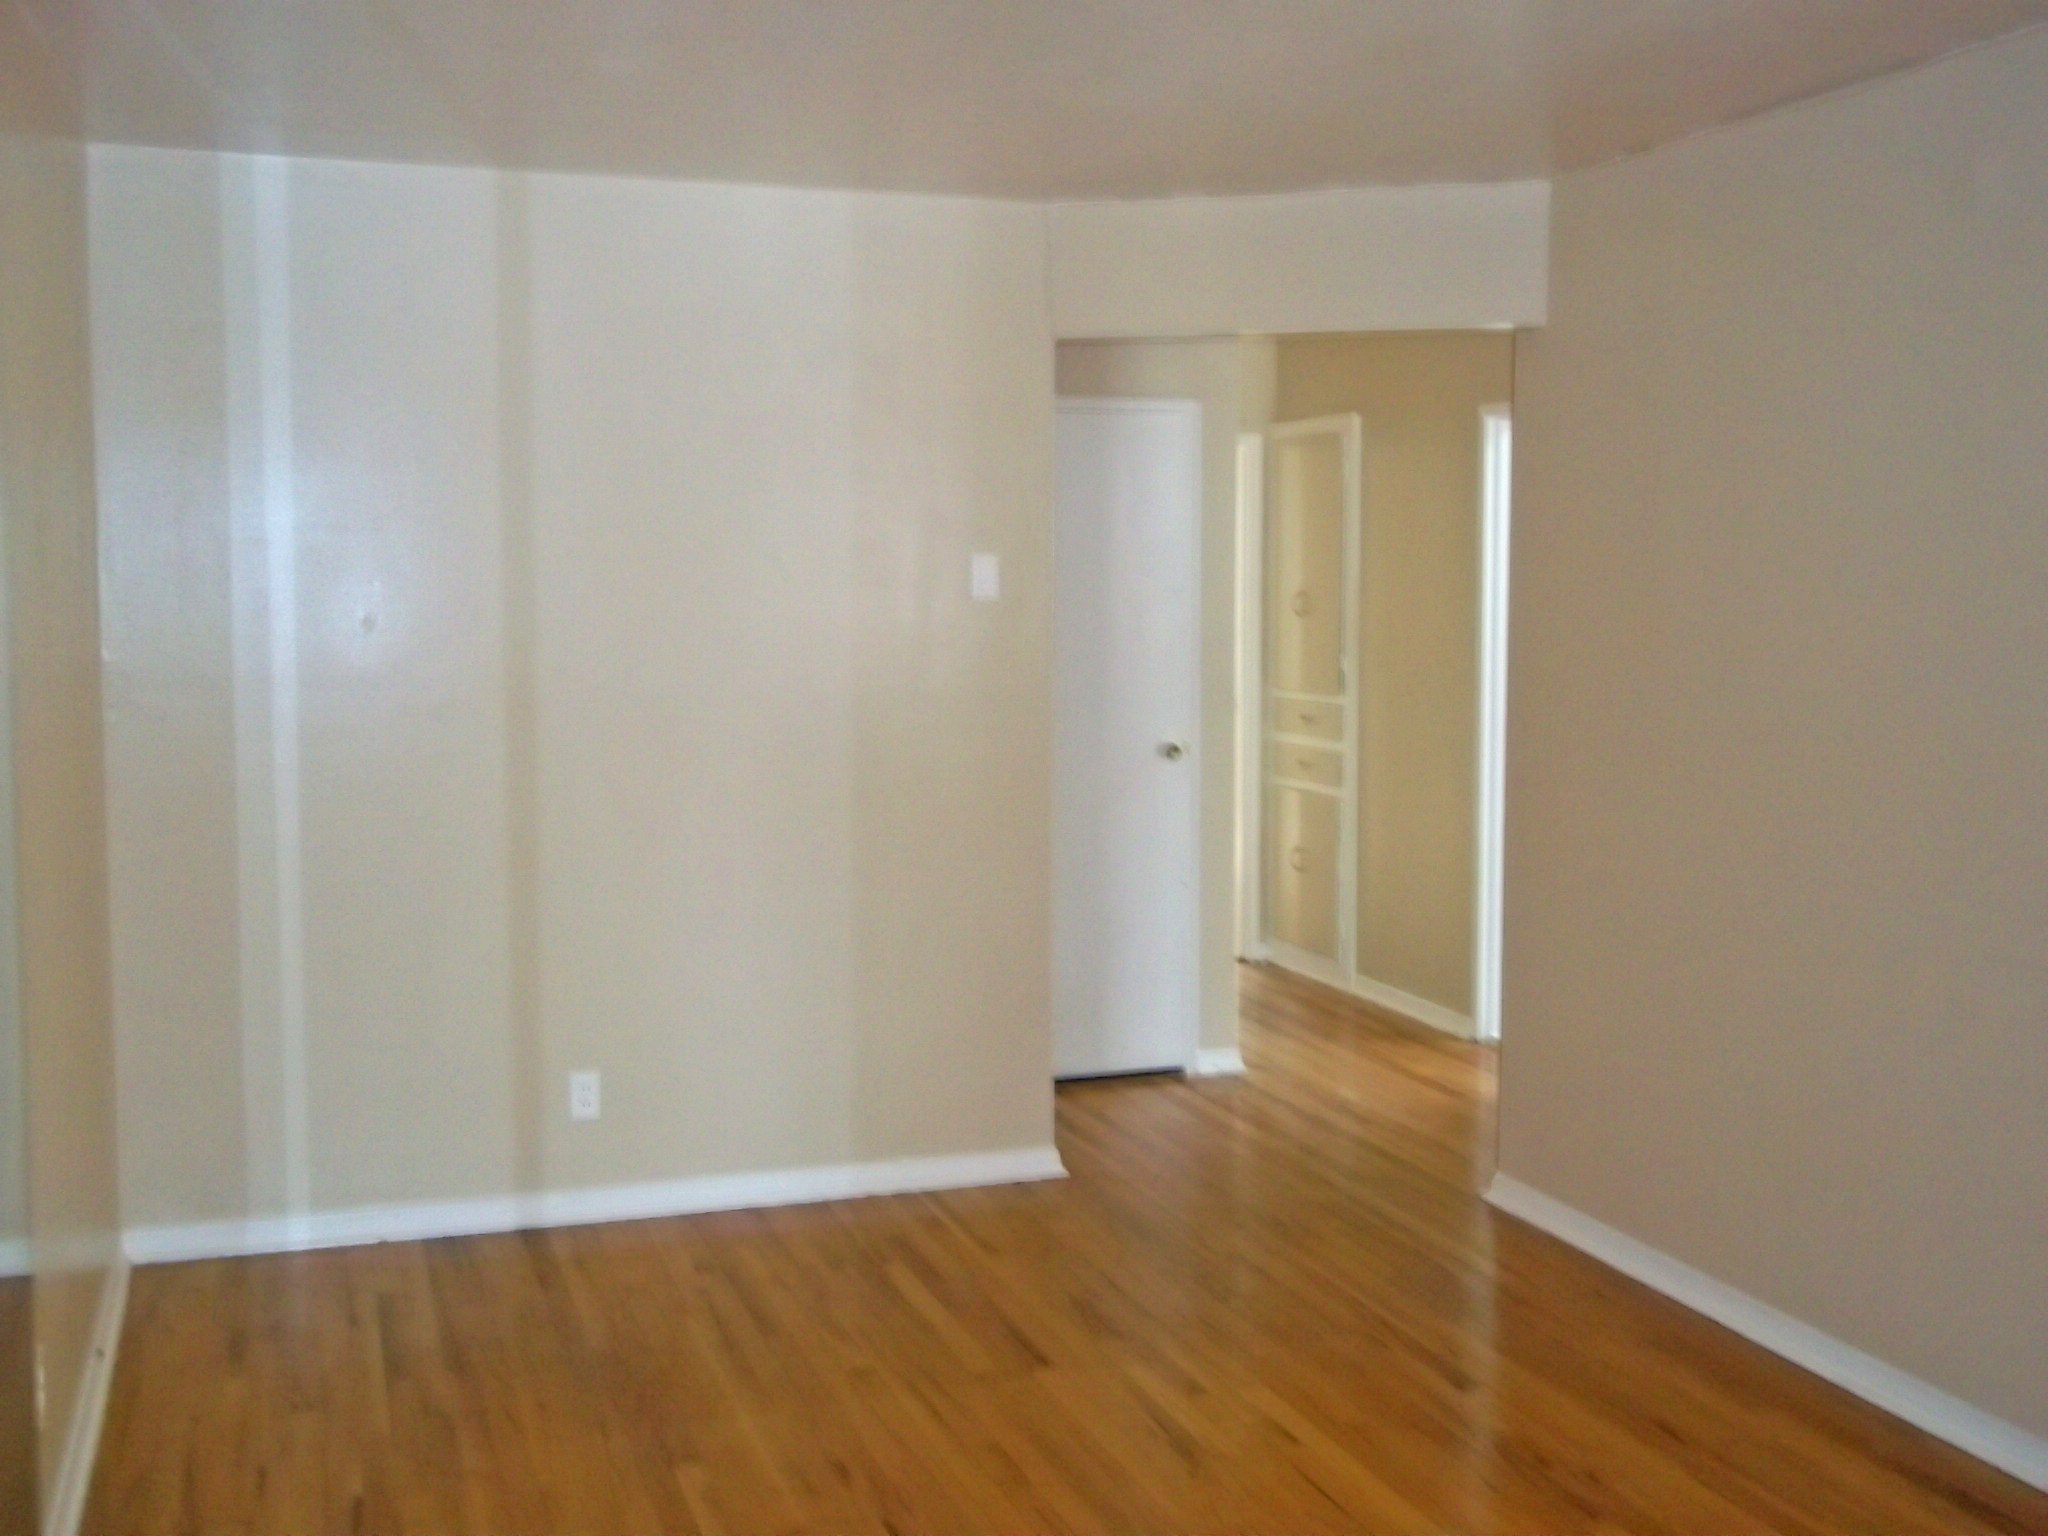 2 Bedroom Apartments In New York City Snsm155 Com